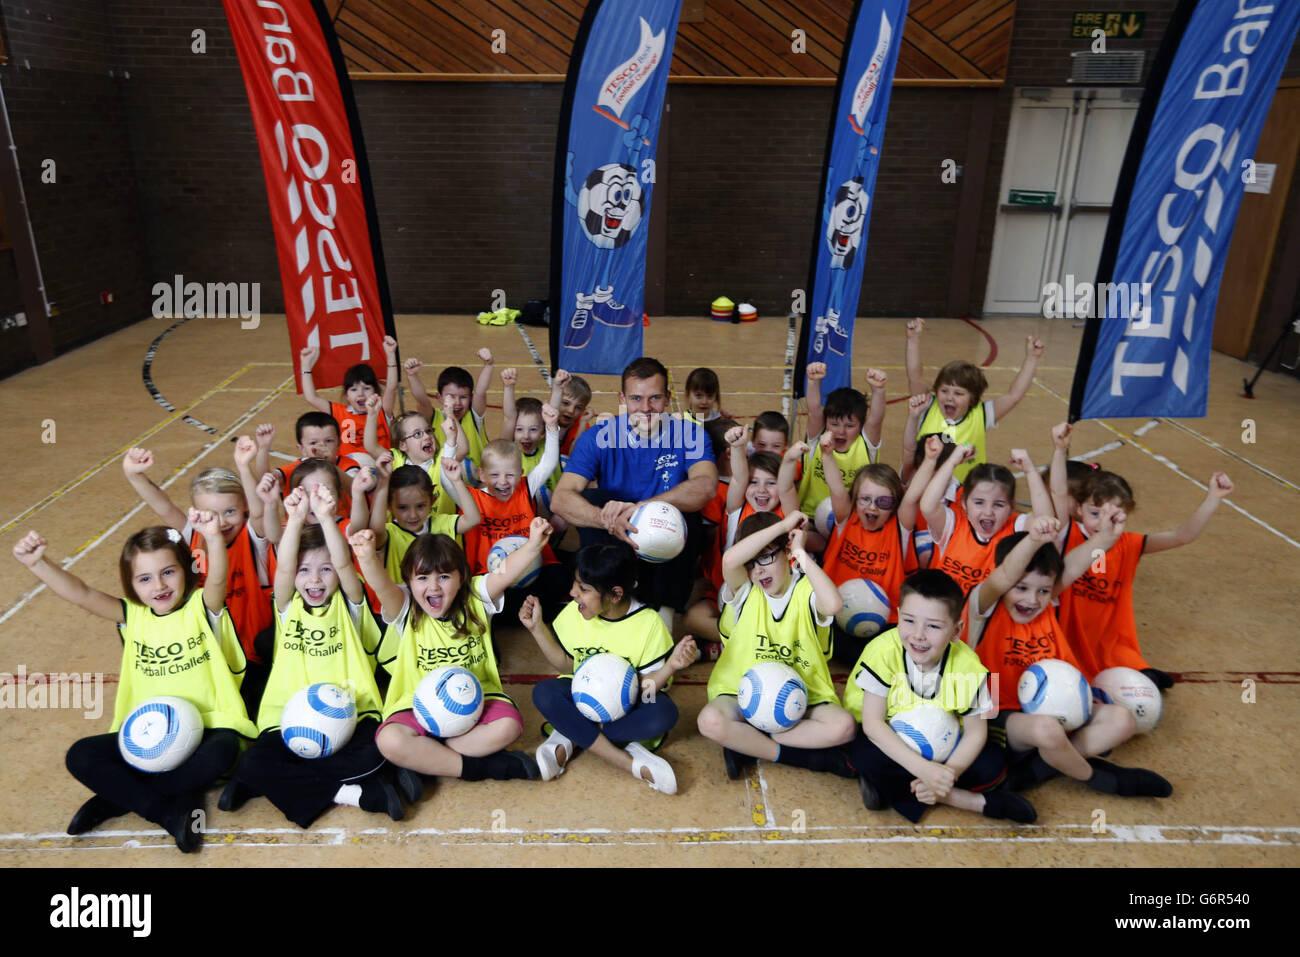 Soccer - Jordan Rhodes Unveiled as Tesco Bank Community